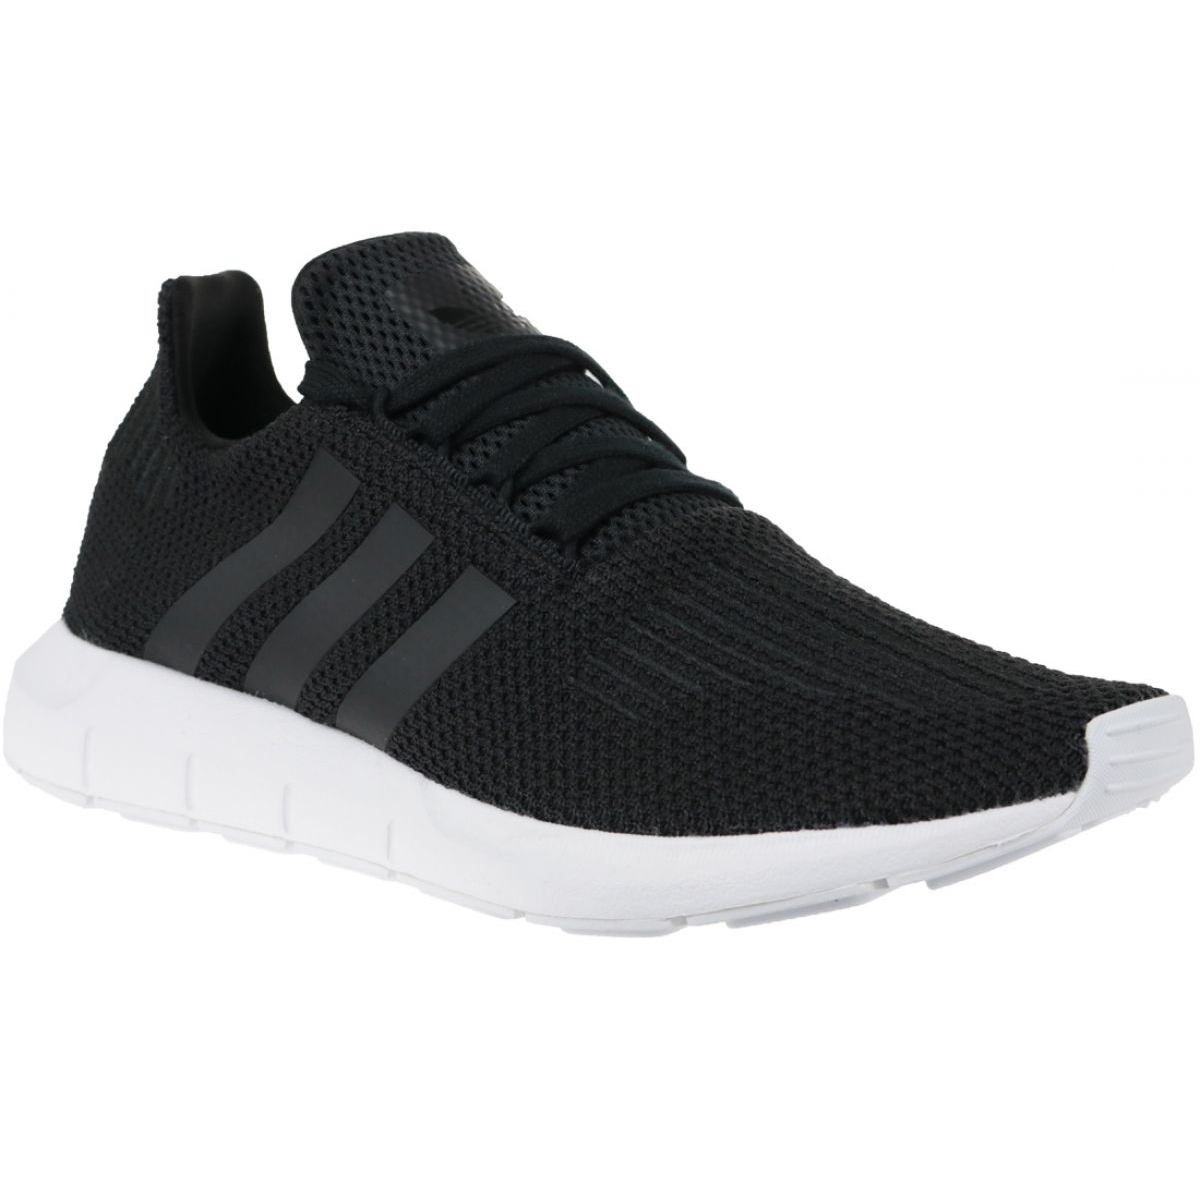 Női Adidas Swift Run Primeknit Originals Cipő Fekete Szürke